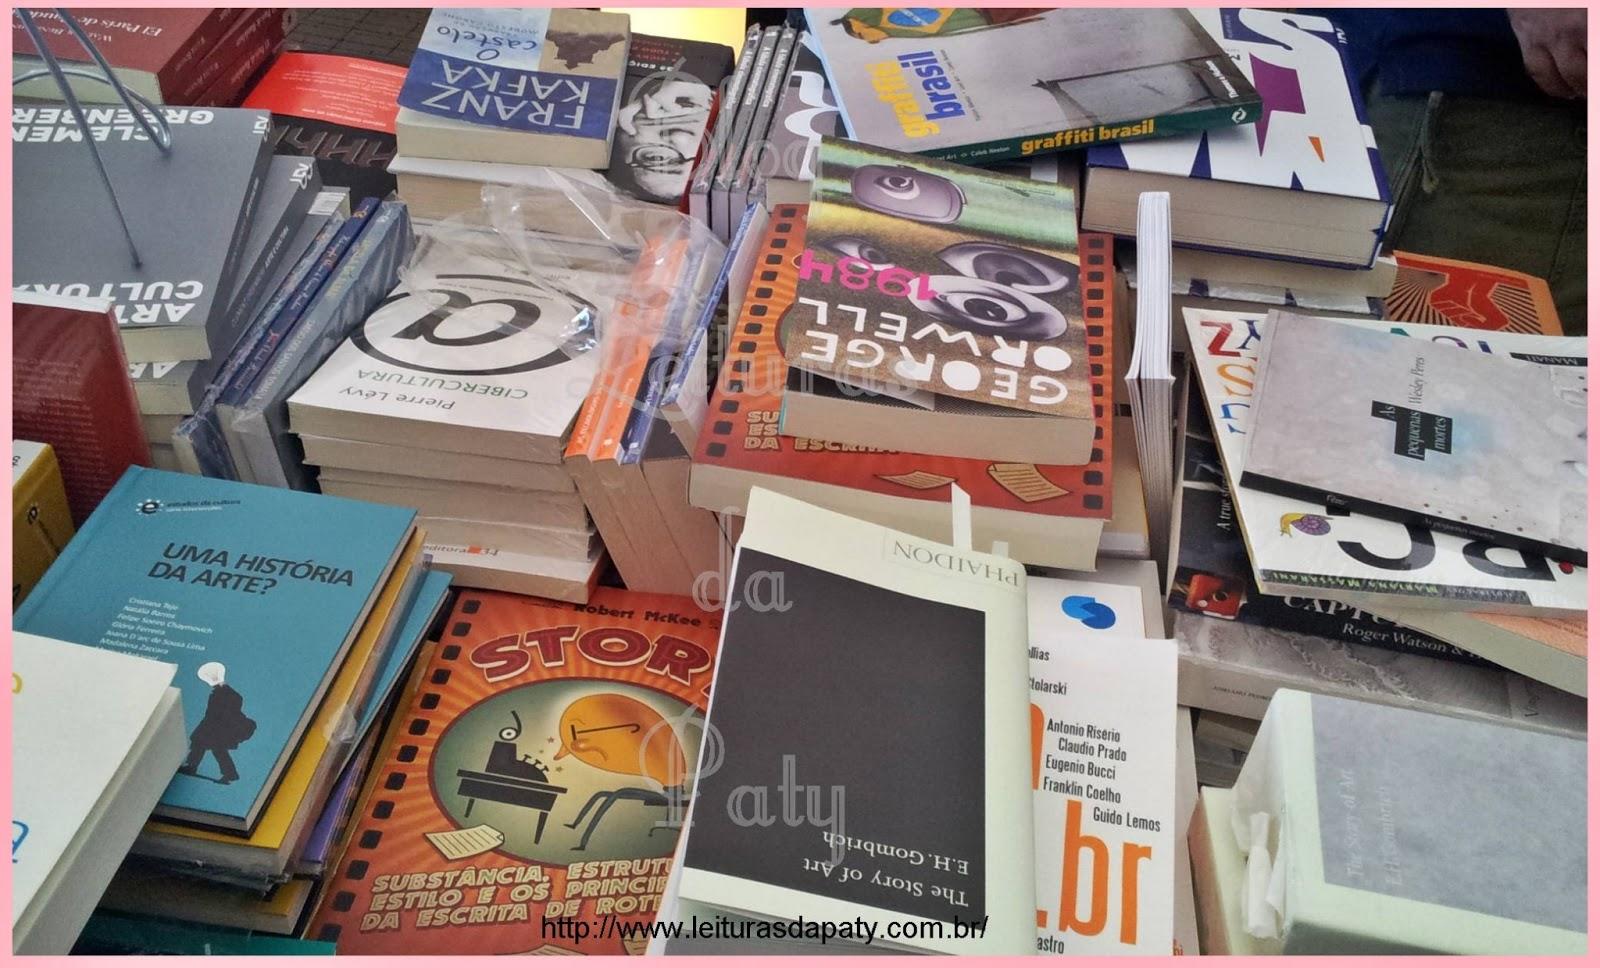 Flip 2013 - Paraty - Blog Leituras da Paty